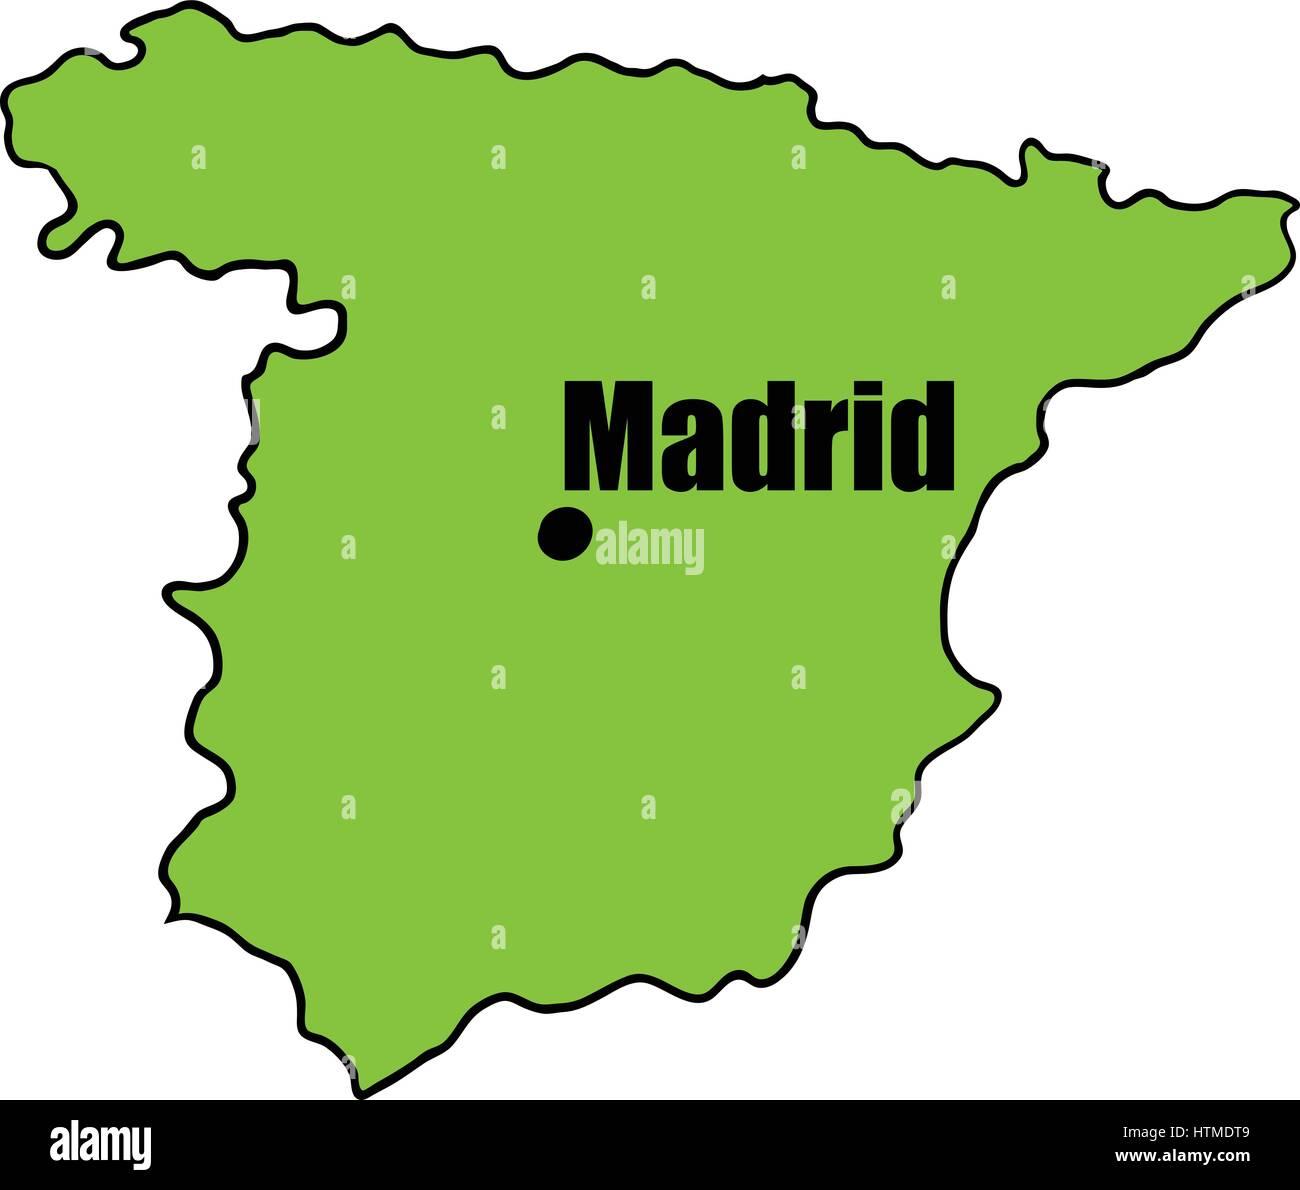 Madrid Spain Europe Map Stock Photos & Madrid Spain Europe Map Stock ...